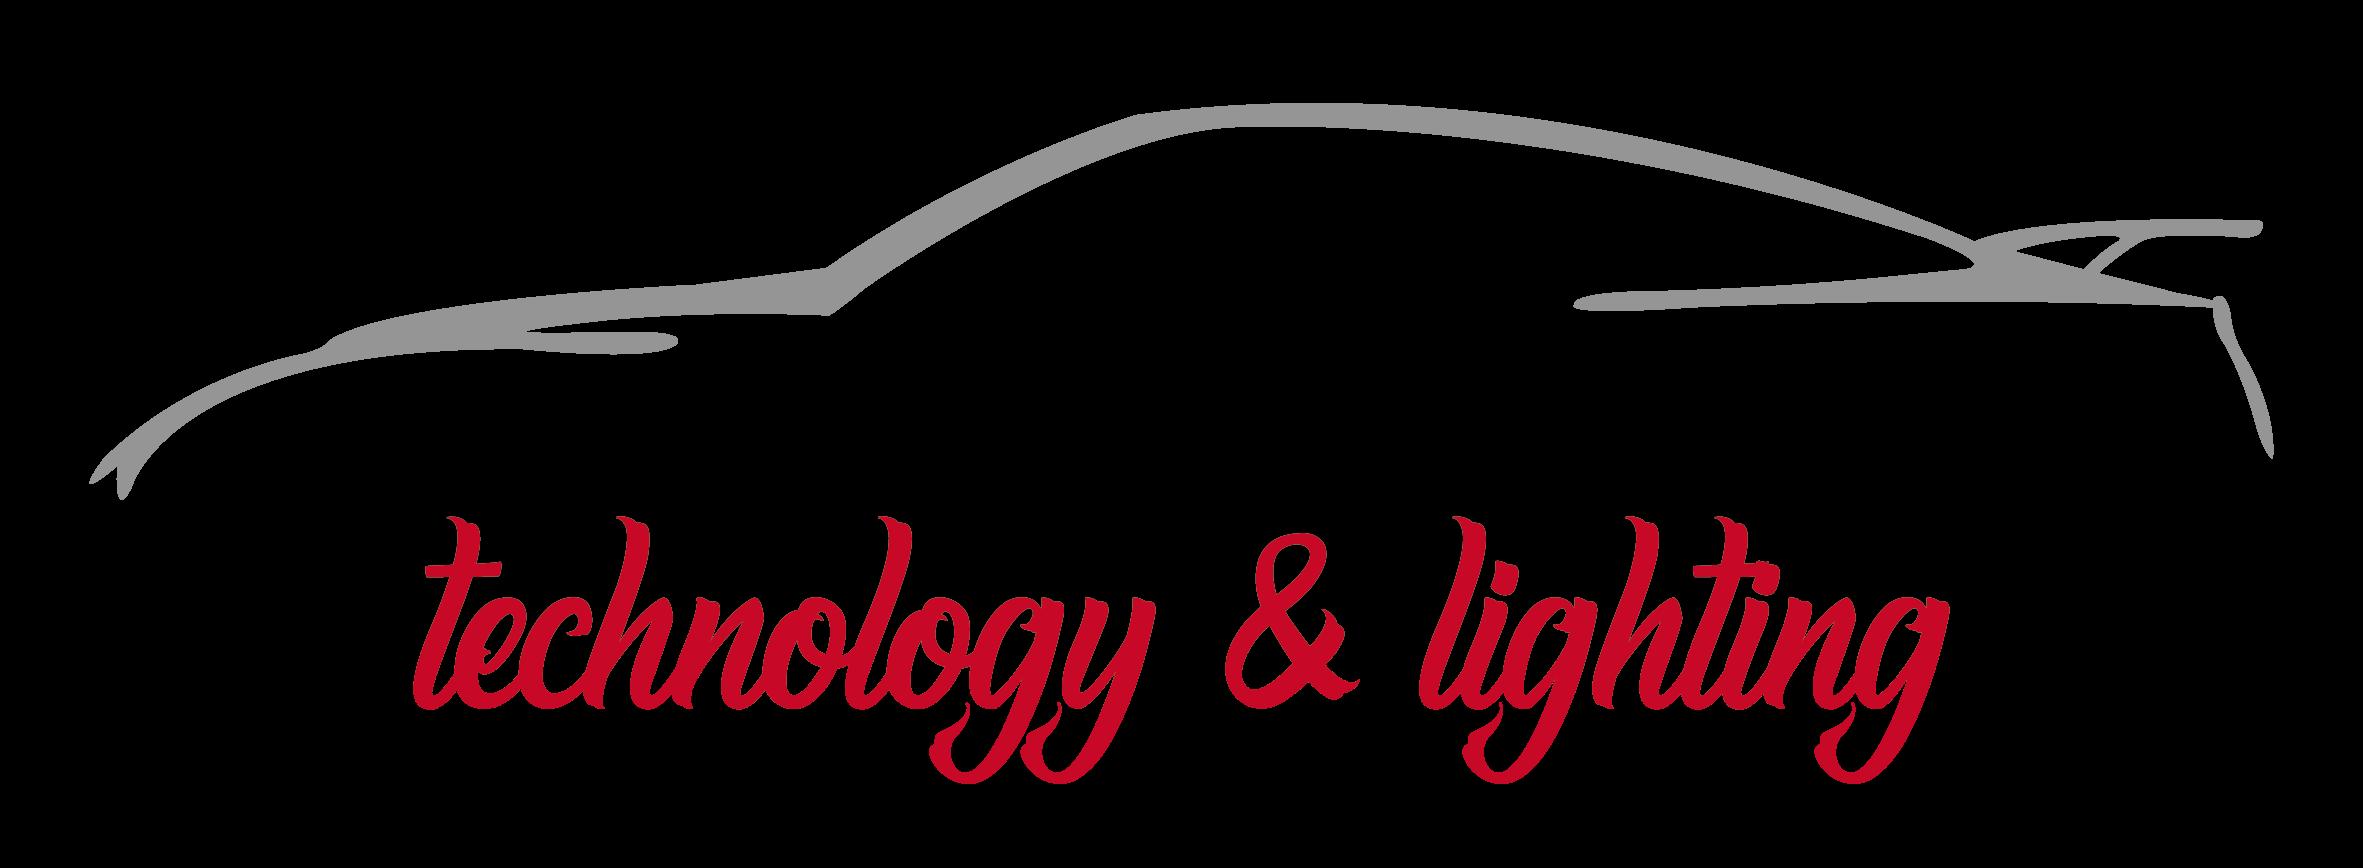 ATL-Automotive, Technology & Lighting